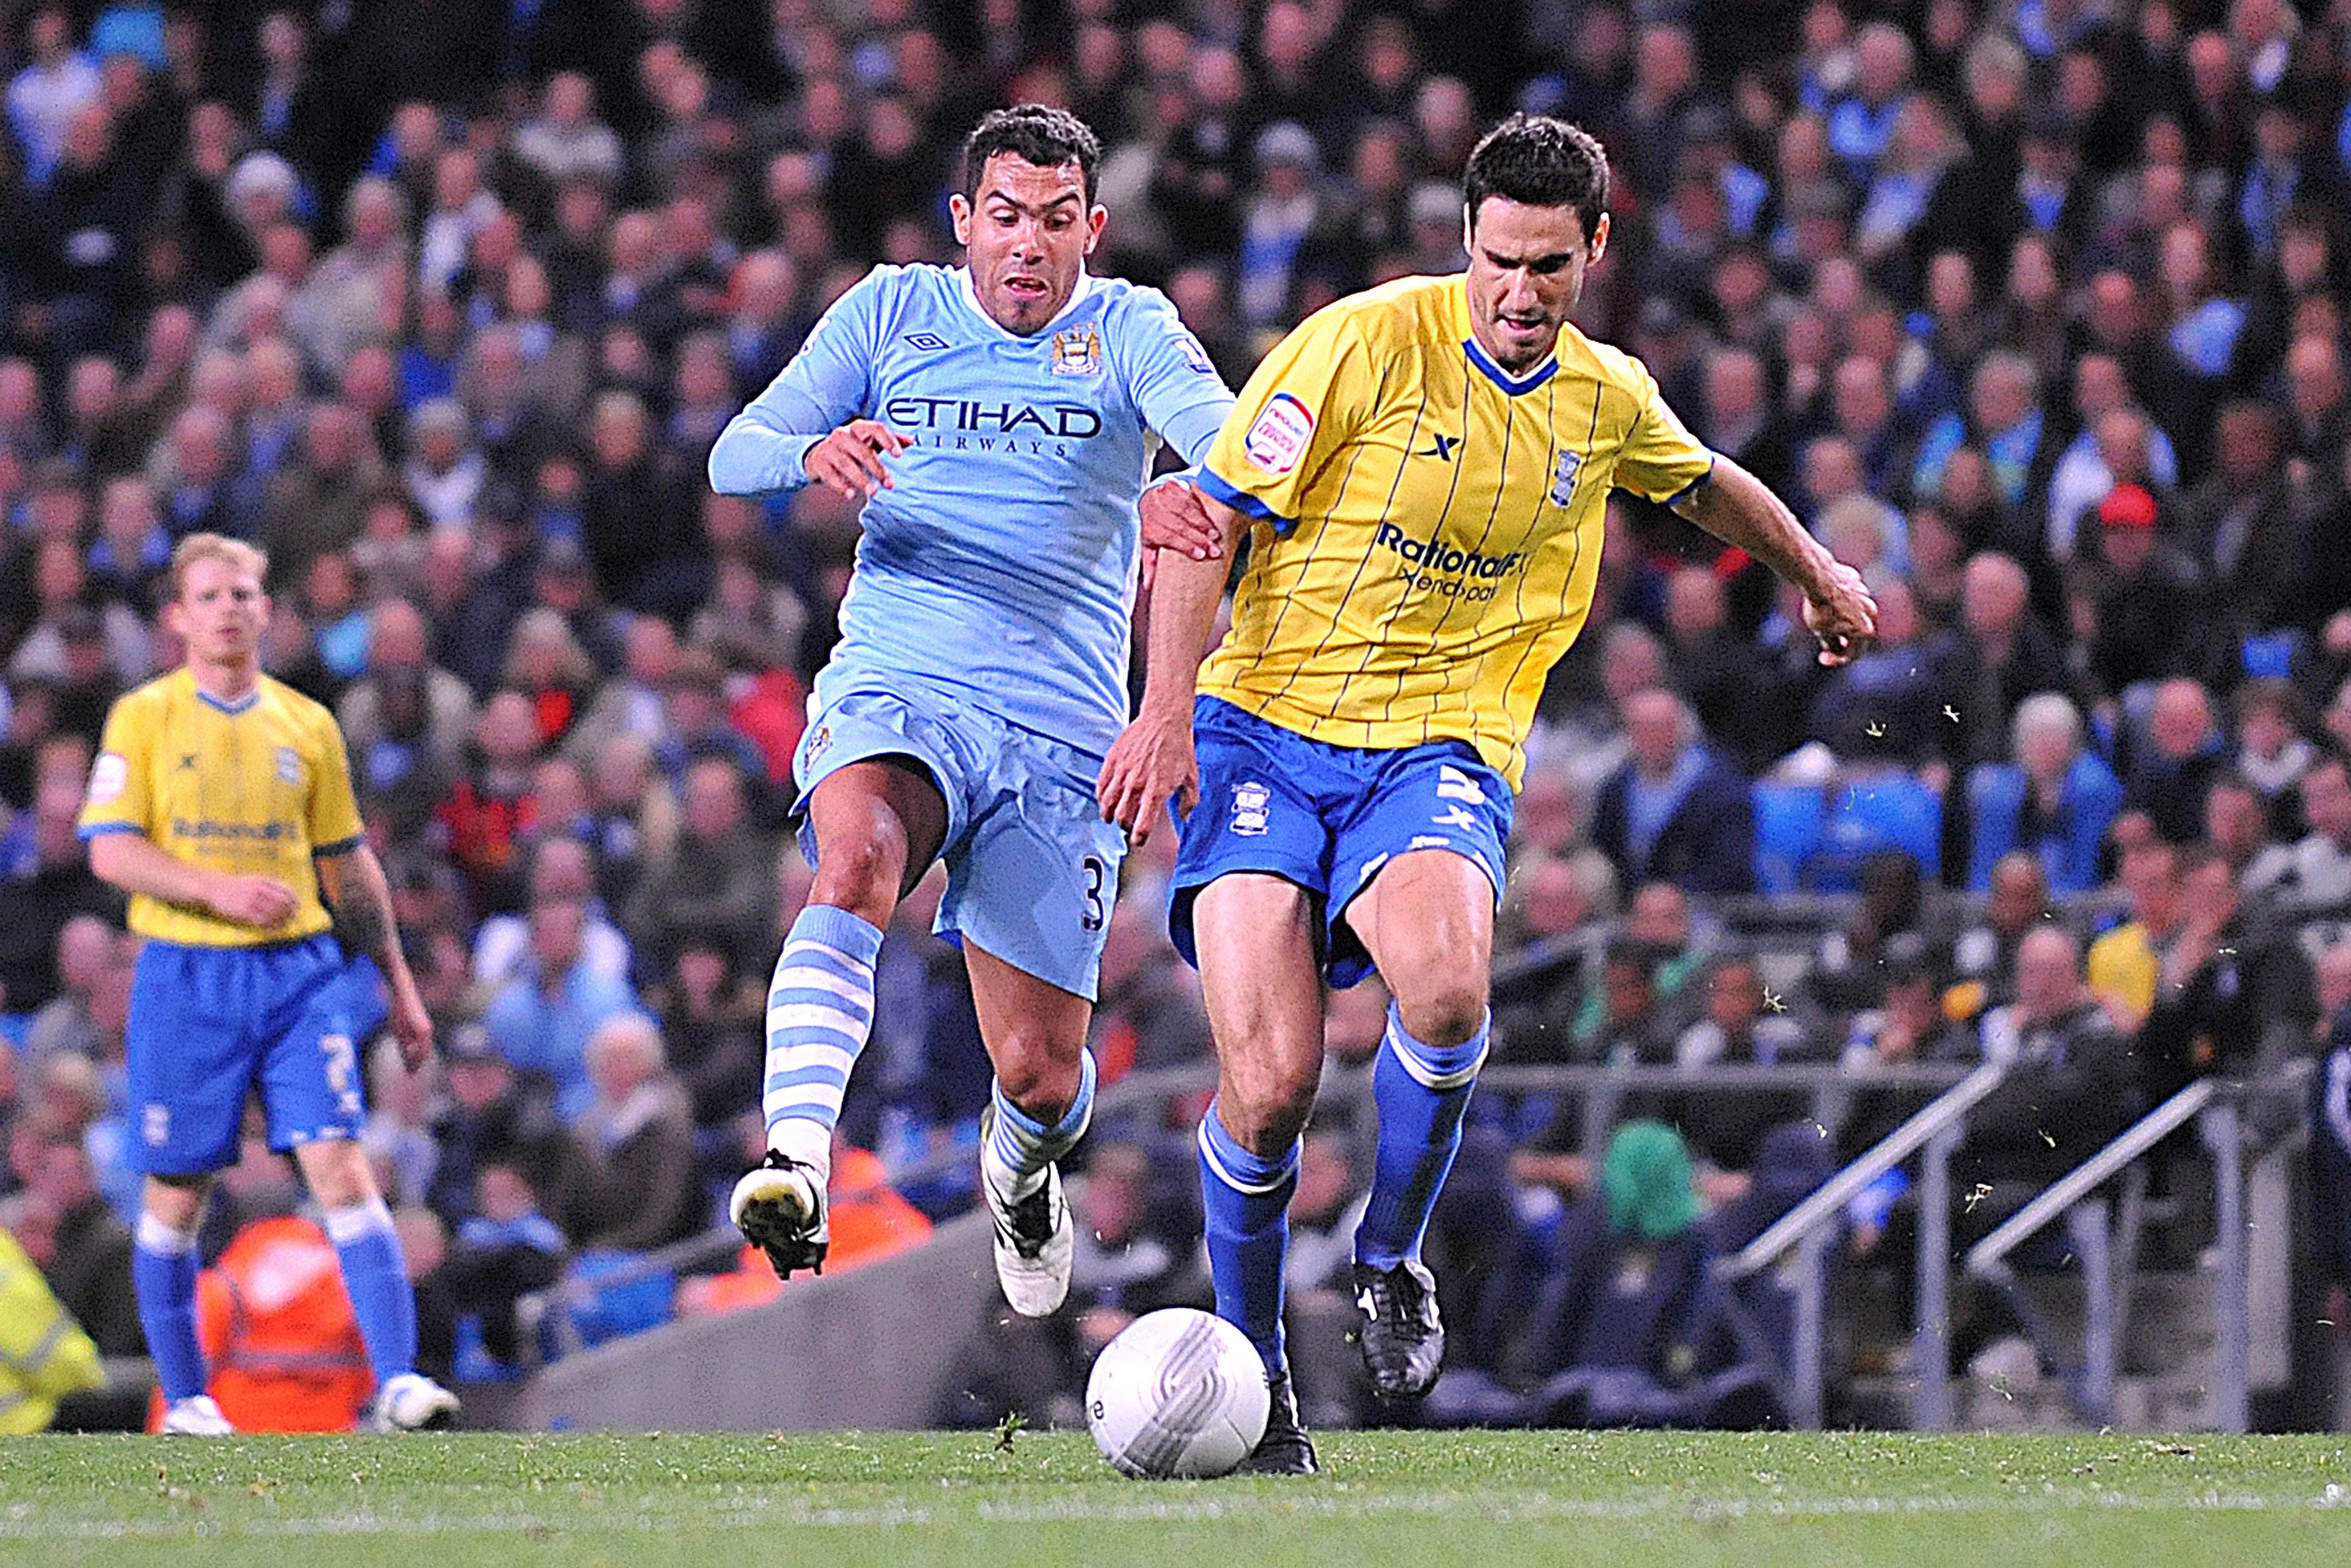 Soccer - Carling Cup - Third Round - Manchester City v Birmingham City - Etihad Stadium